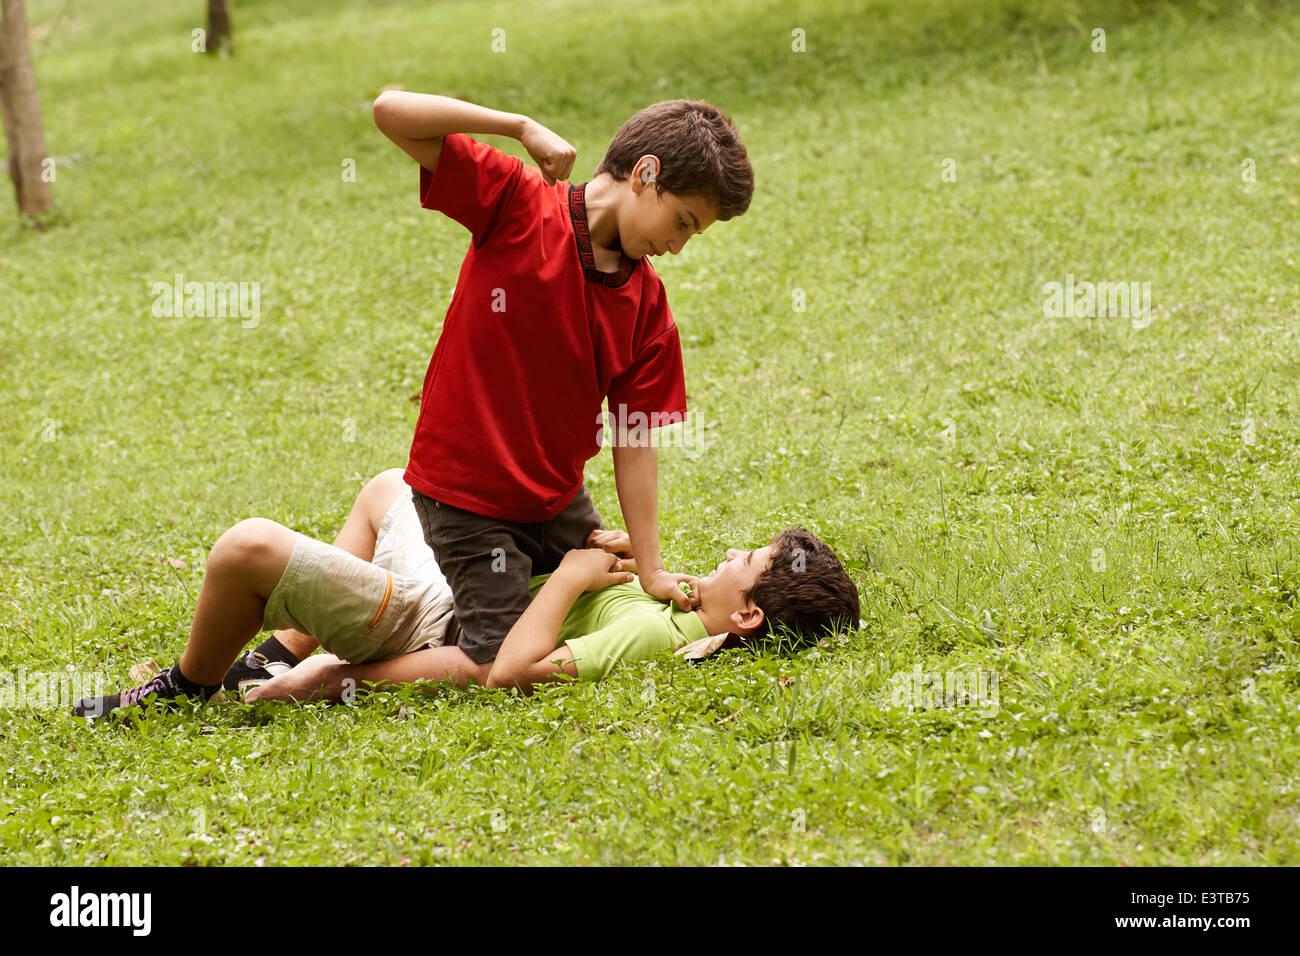 Little Kids Fist Fighting